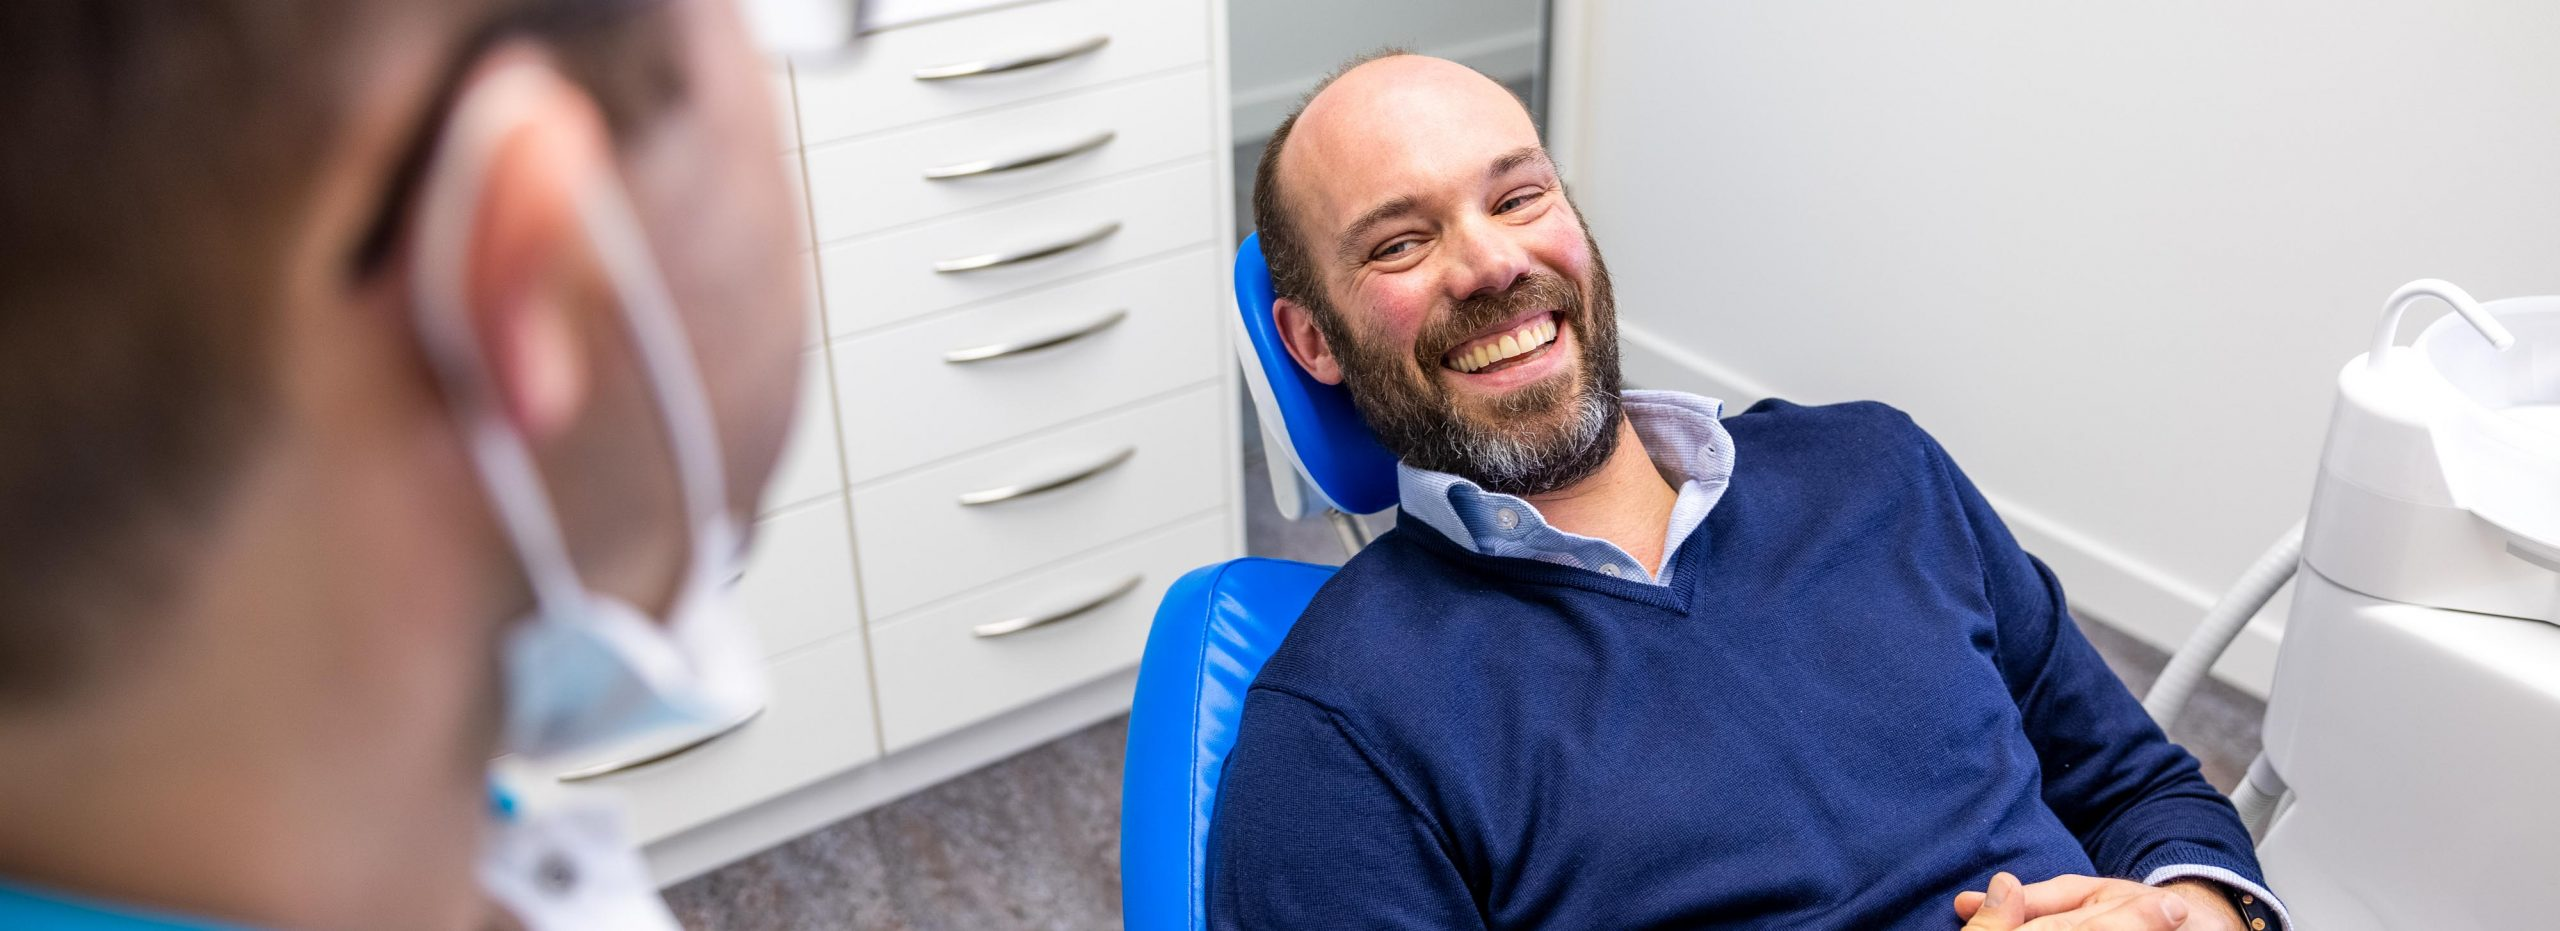 Tandartspraktijk hoflaan tandartsen 15 scaled